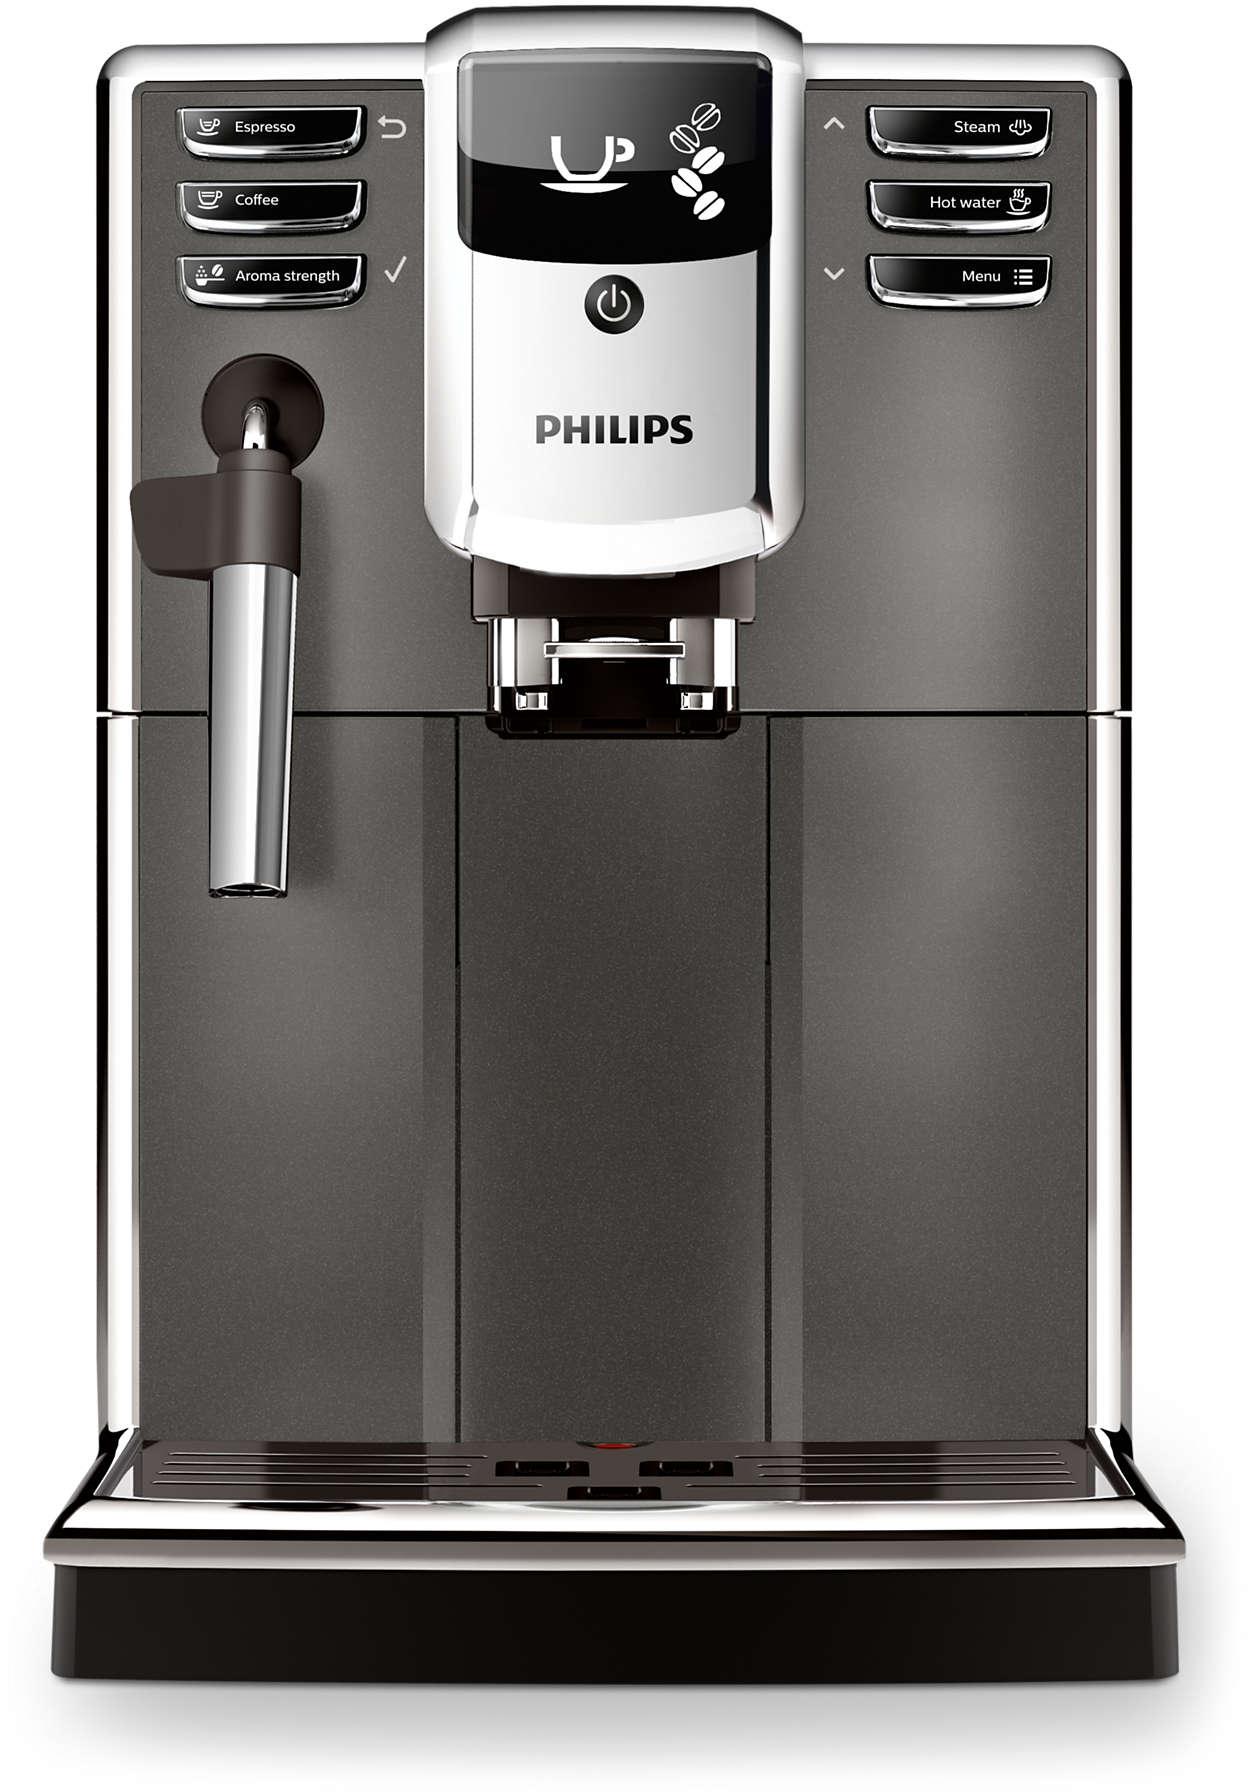 Philips Series 5000 EP5314/10 design